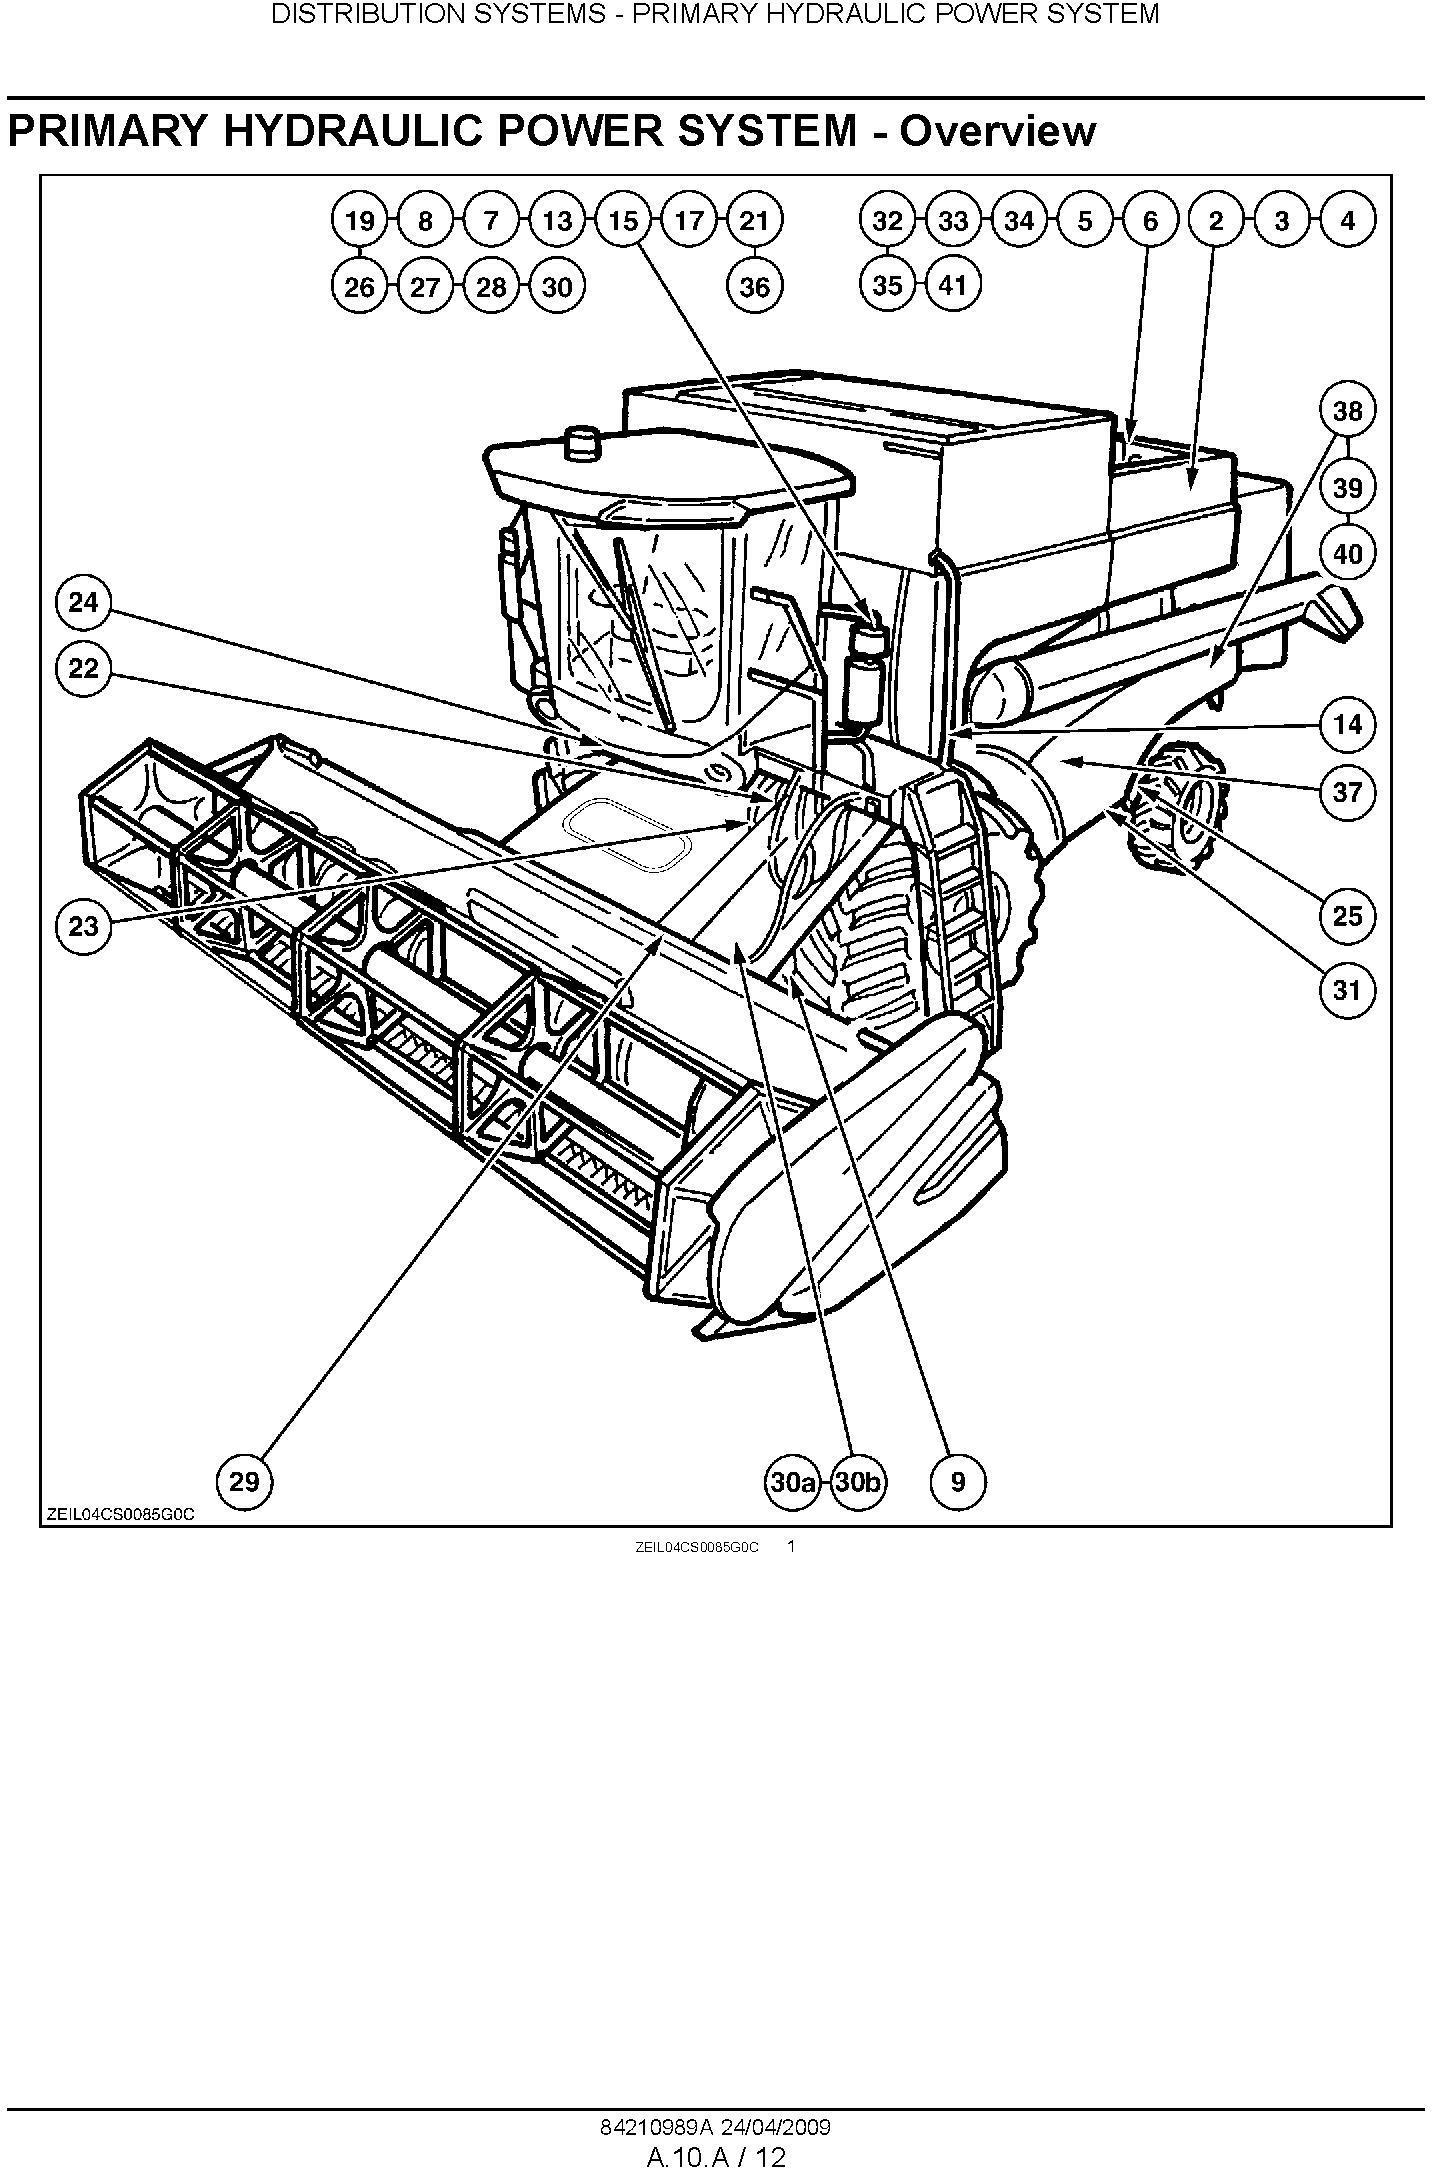 New Holland CSX7040, CSX7050, CSX7060, CSX7070, CSX7080 Combine Service Manual - 1